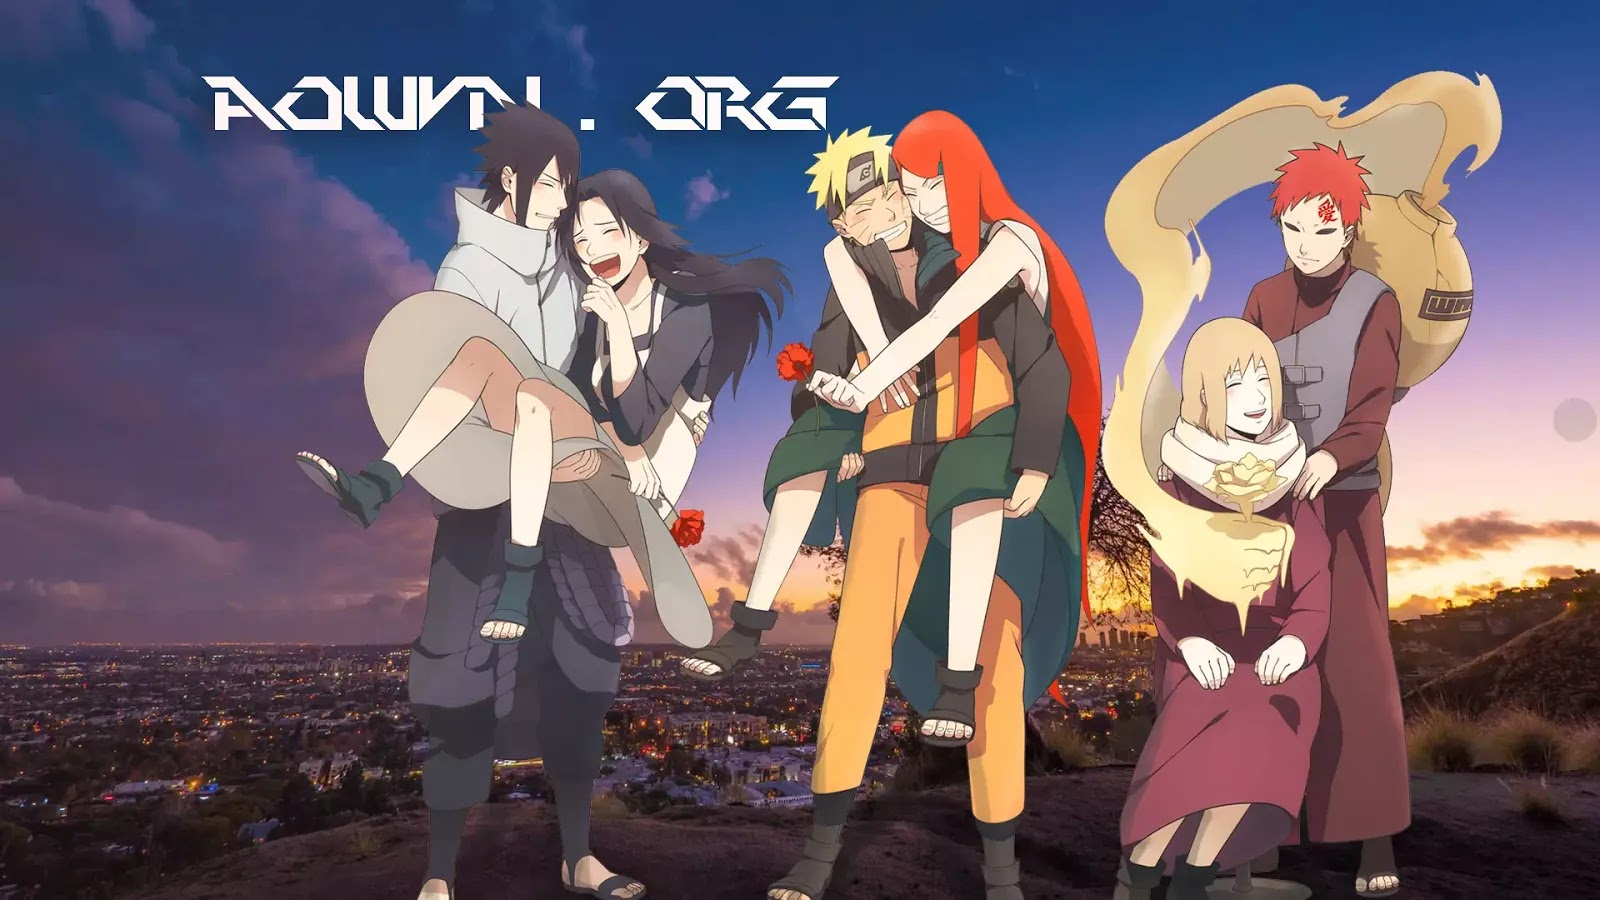 AowVN.org mizn%2B%25283%2529 - [ Anime 3gp Mp4 ] Naruto Shippuuden Season 2  | Vietsub - Huyền thoại